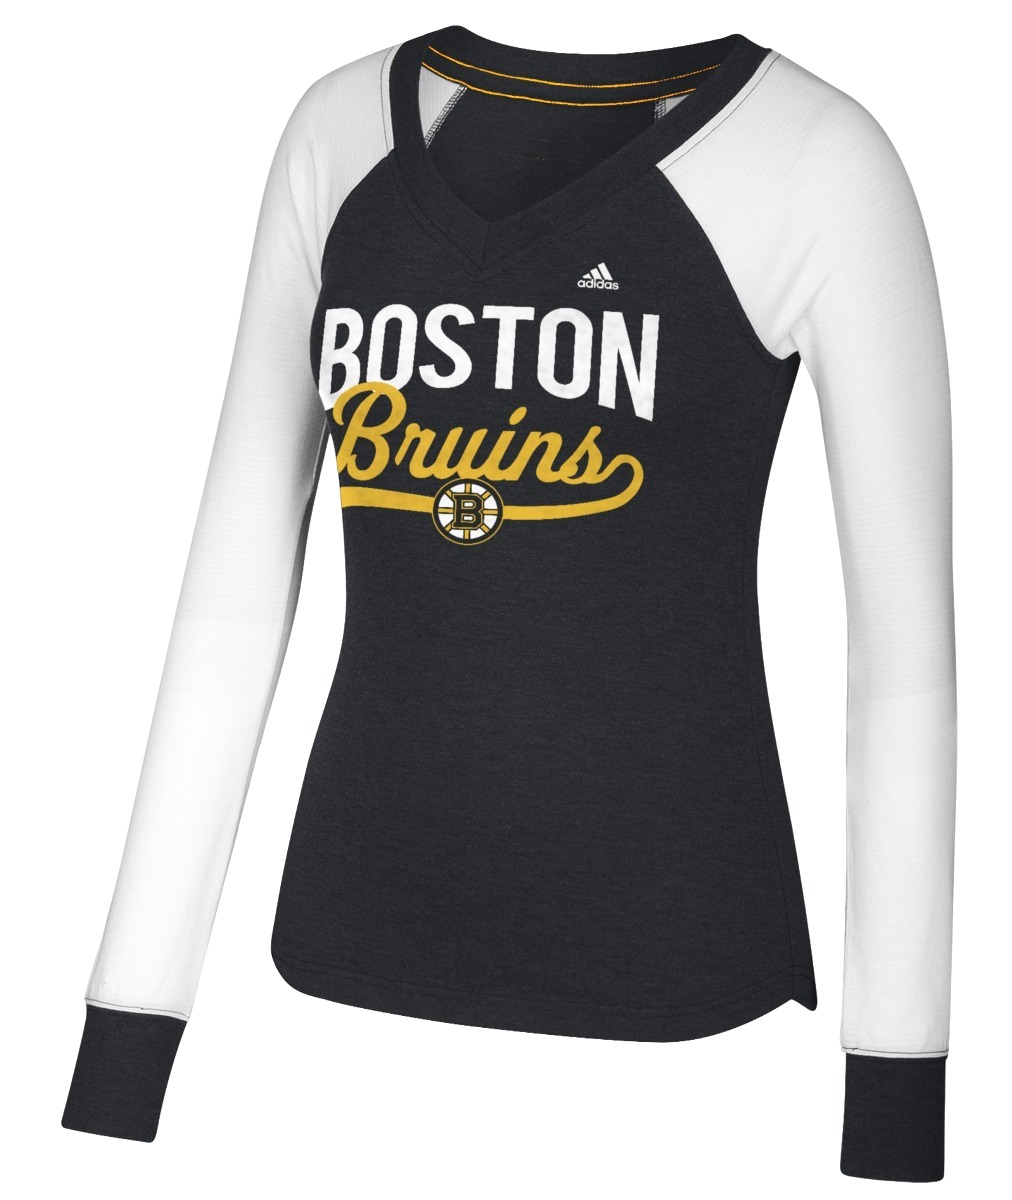 "Boston Bruins Women's Adidas NHL ""Puck Drop"" Dual Blend Long Sleeve T-shirt by Adidas"